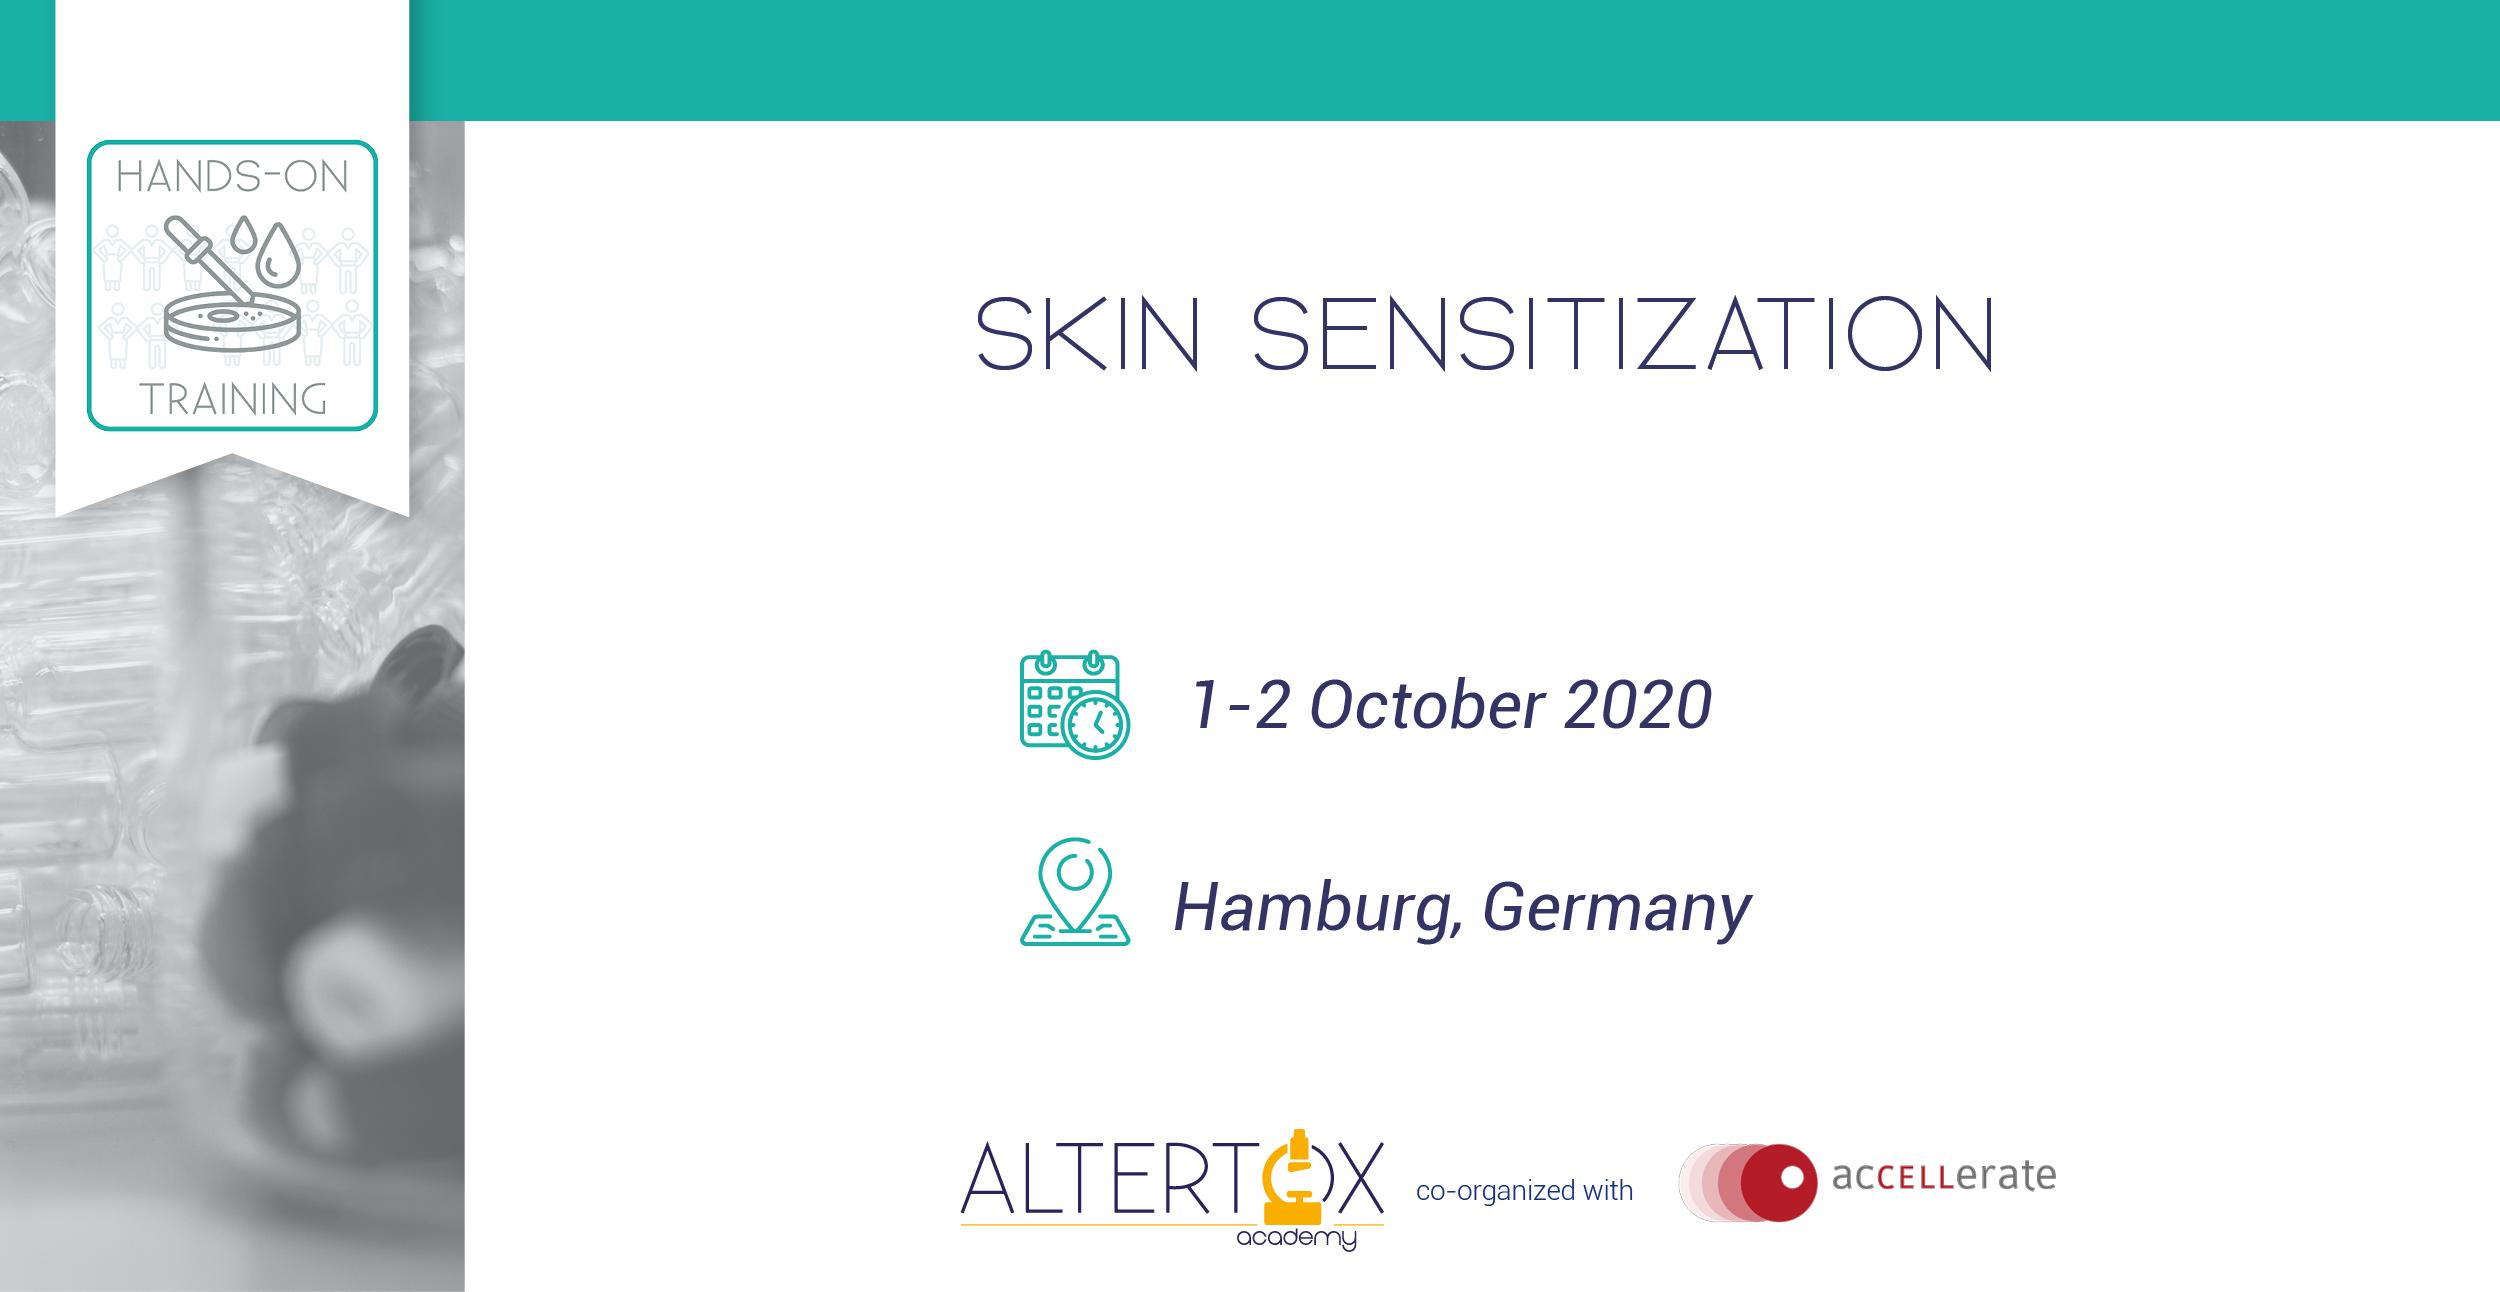 Skin sensitization